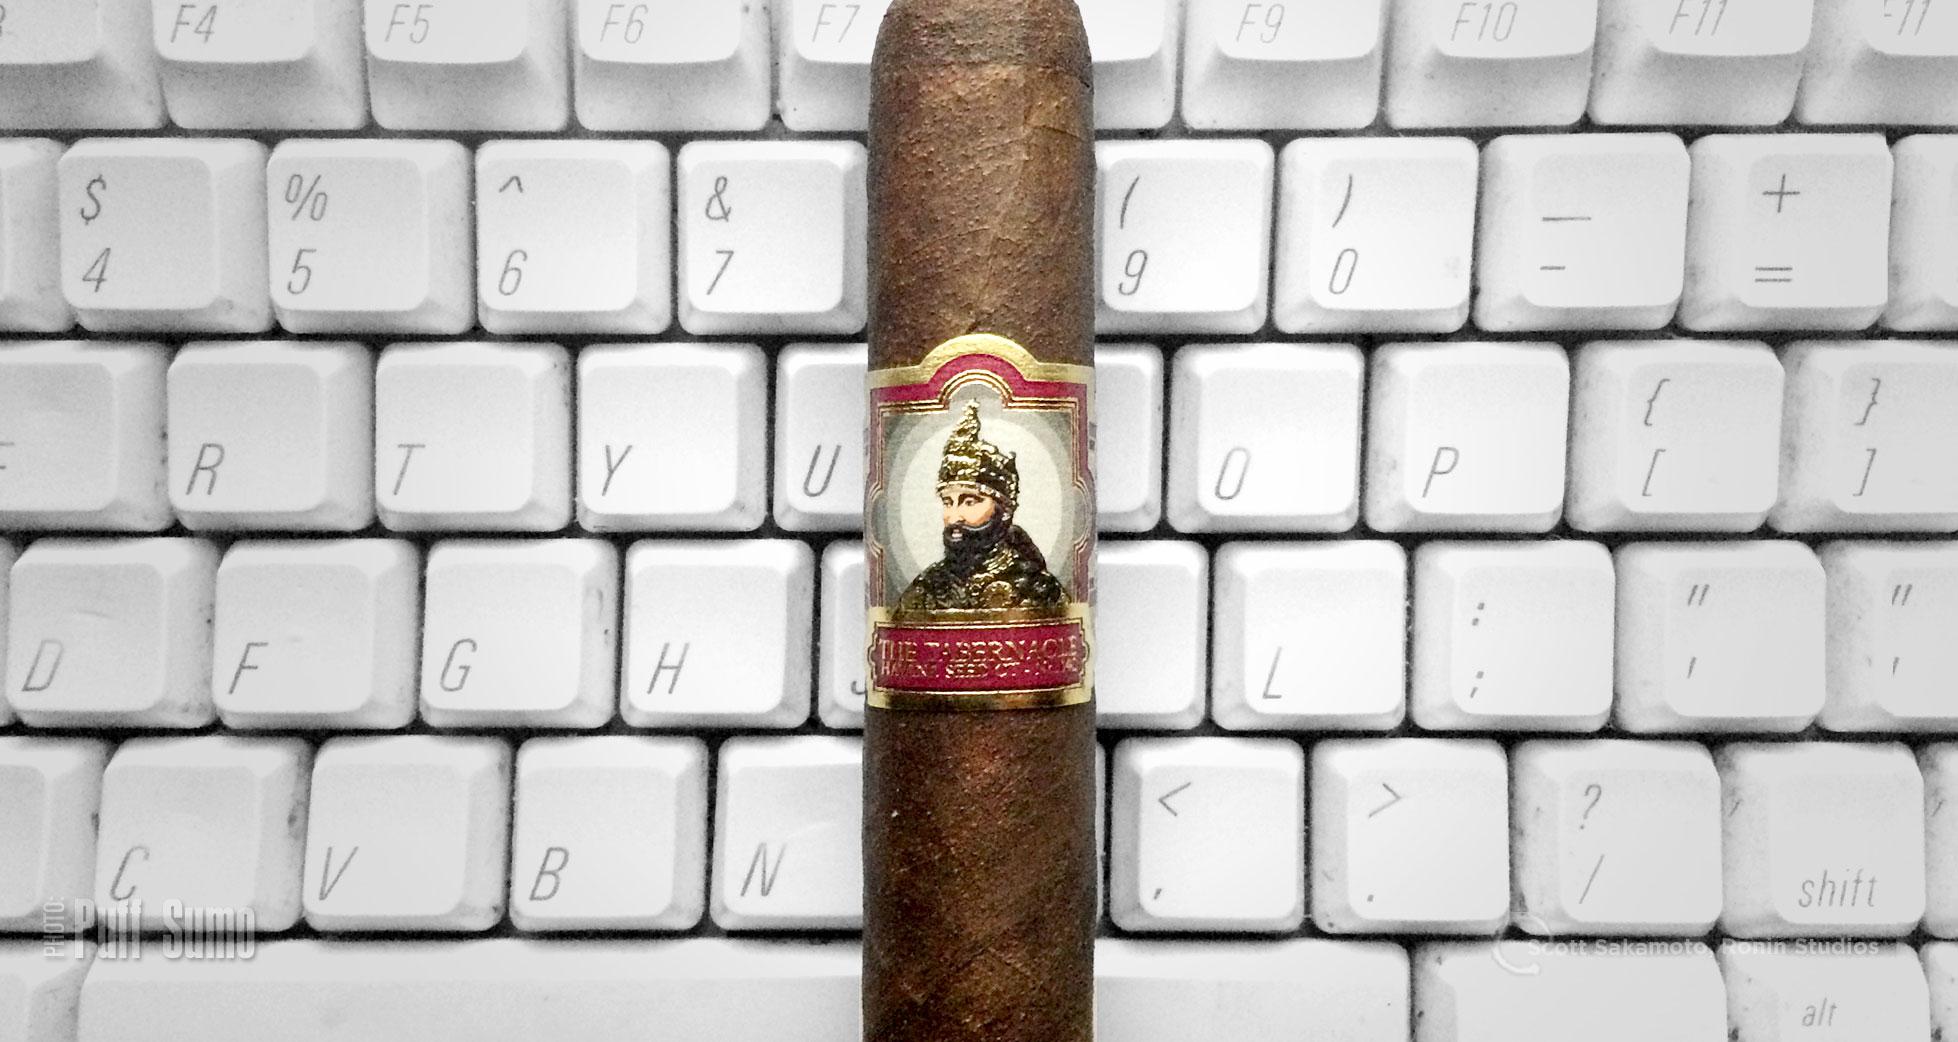 Esteli and Jalapa Valley Nicaragua, Foundation Cigar, Foundation Cigars, Havana Seed CT No. 142, Jamastran Valley Honduras, San Andreas Mexico, The Tabernacle